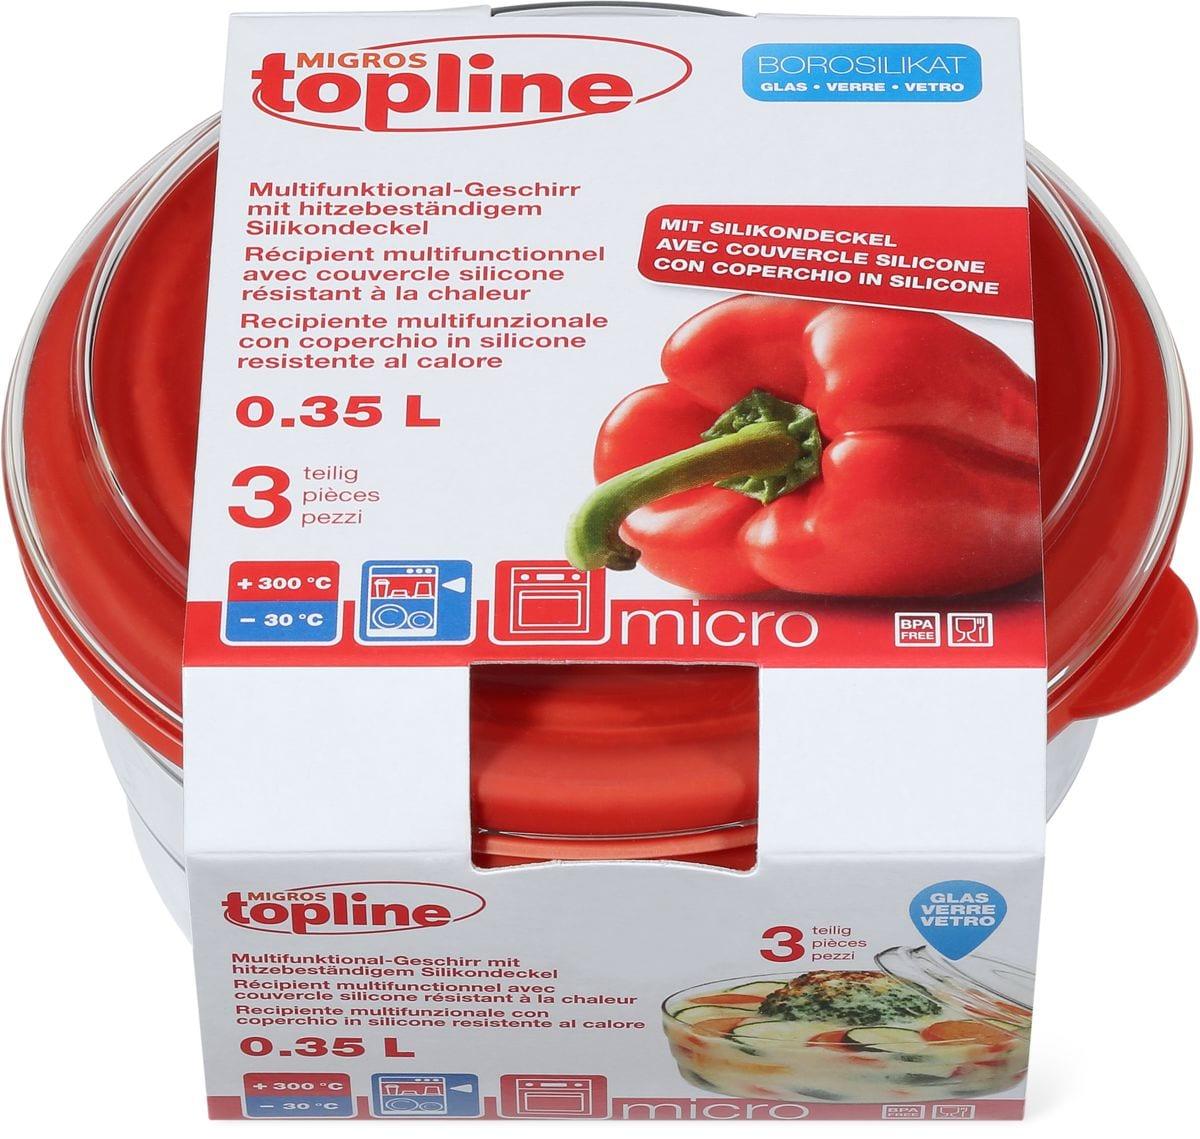 M-Topline MICRO Multifunktional-Geschirr 0.35L